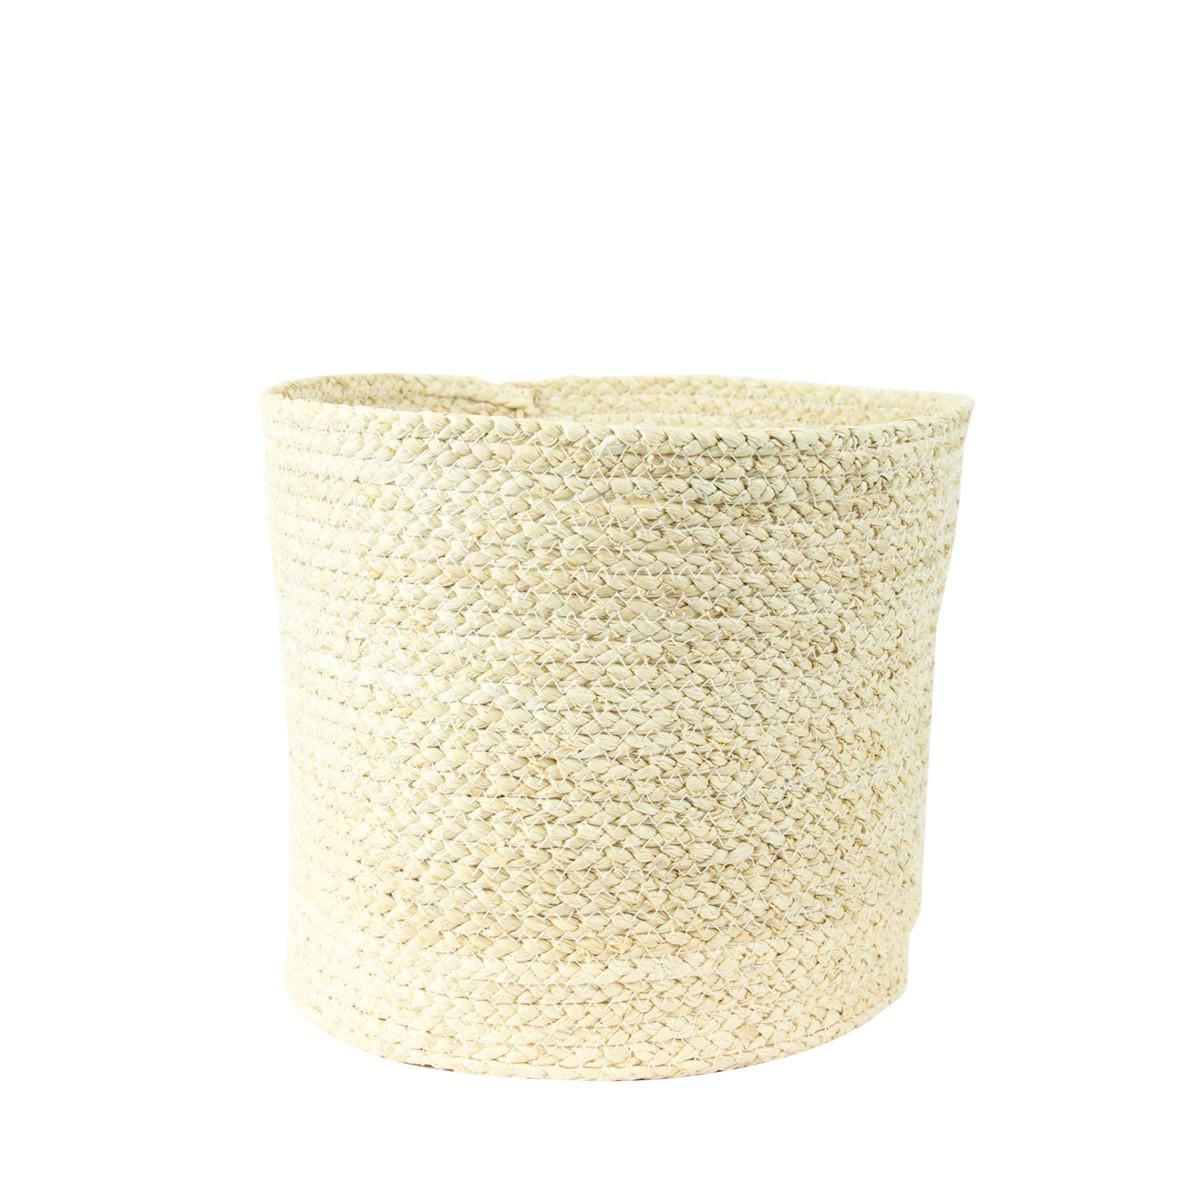 corbeille papier en fibres naturelles. Black Bedroom Furniture Sets. Home Design Ideas